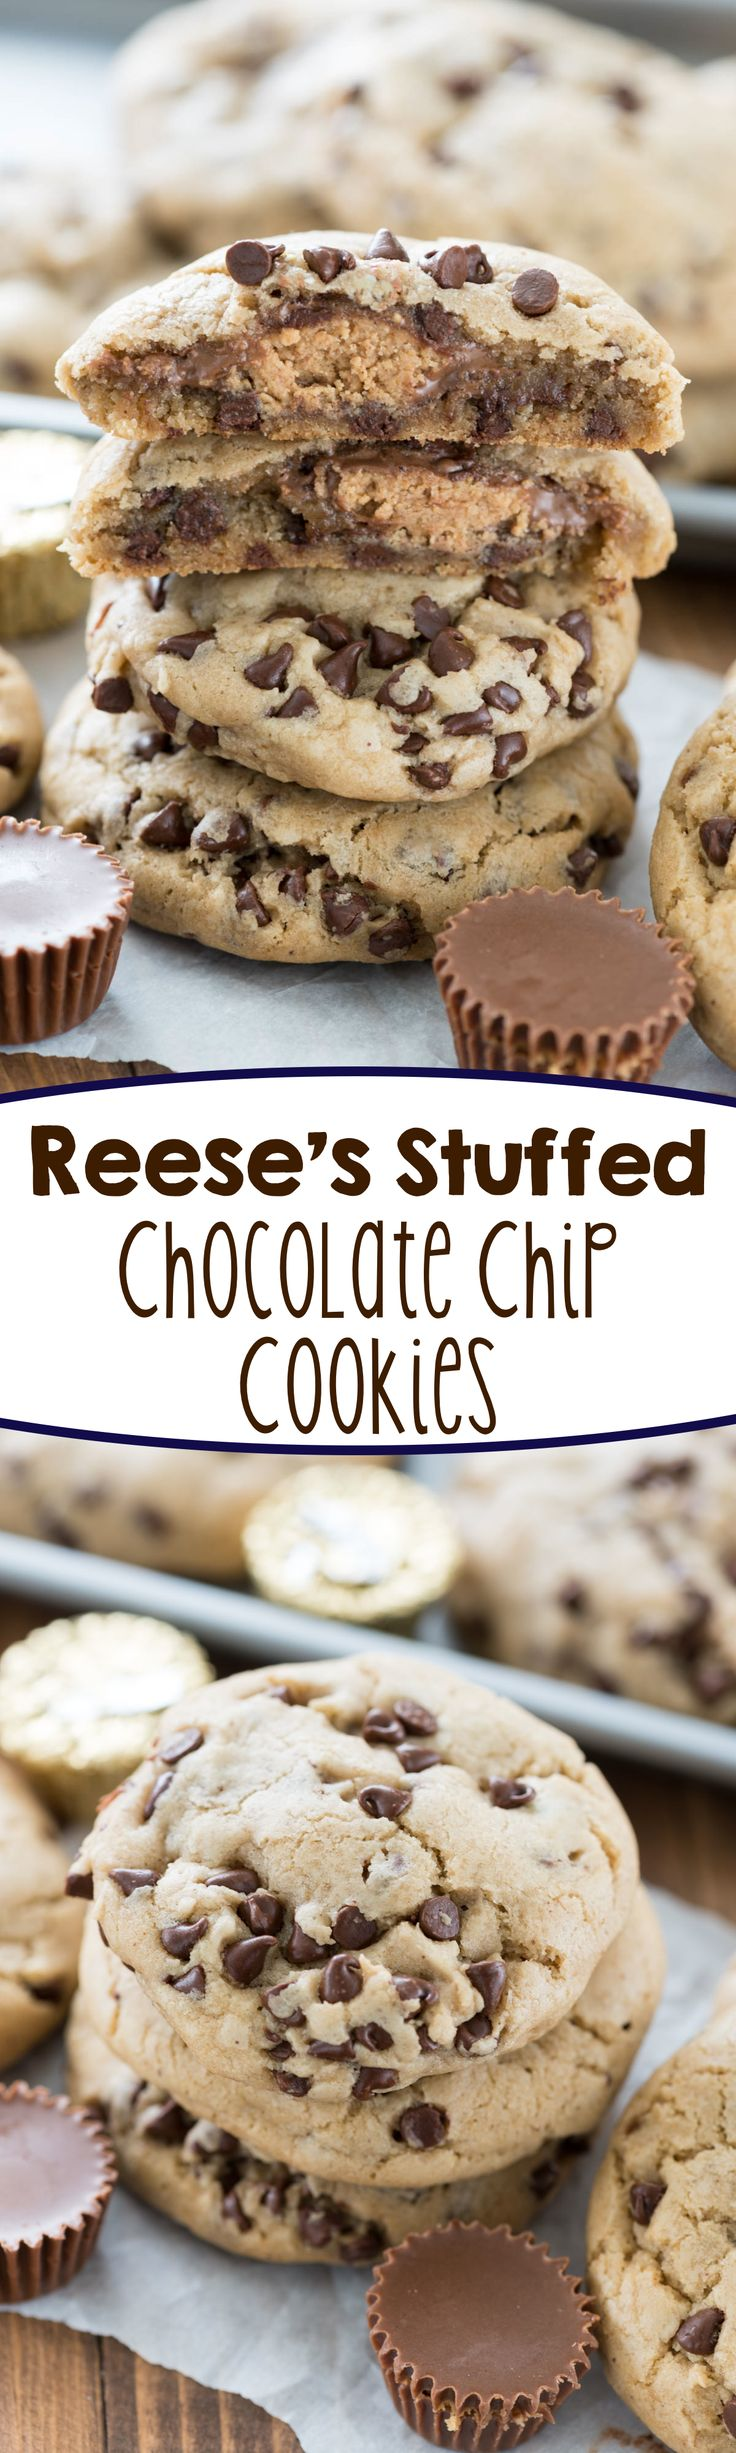 Reese's Stuffed Chocolate Chip Cookies